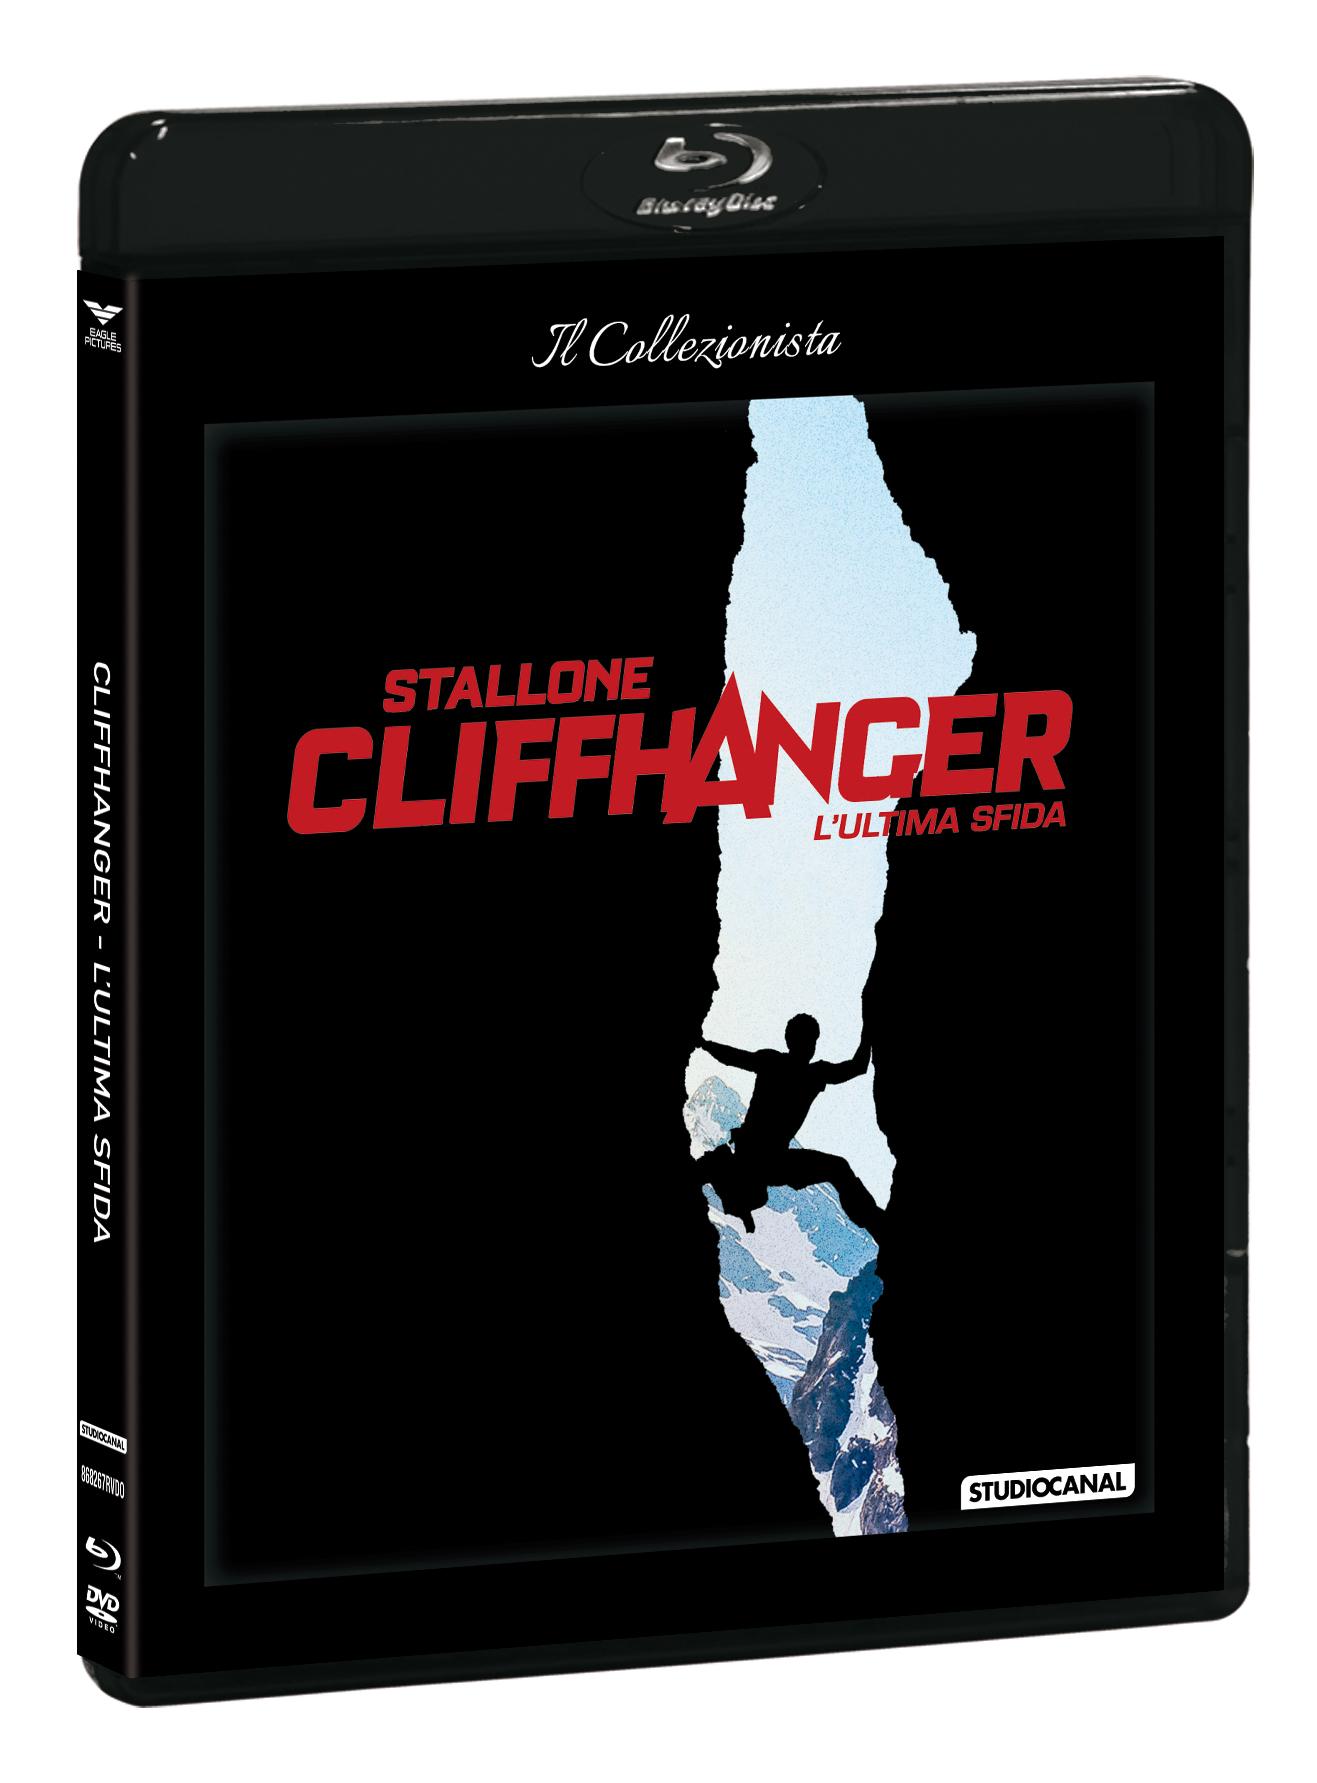 CLIFFHANGER - L'ULTIMA SFIDA (BLU-RAY+DVD)